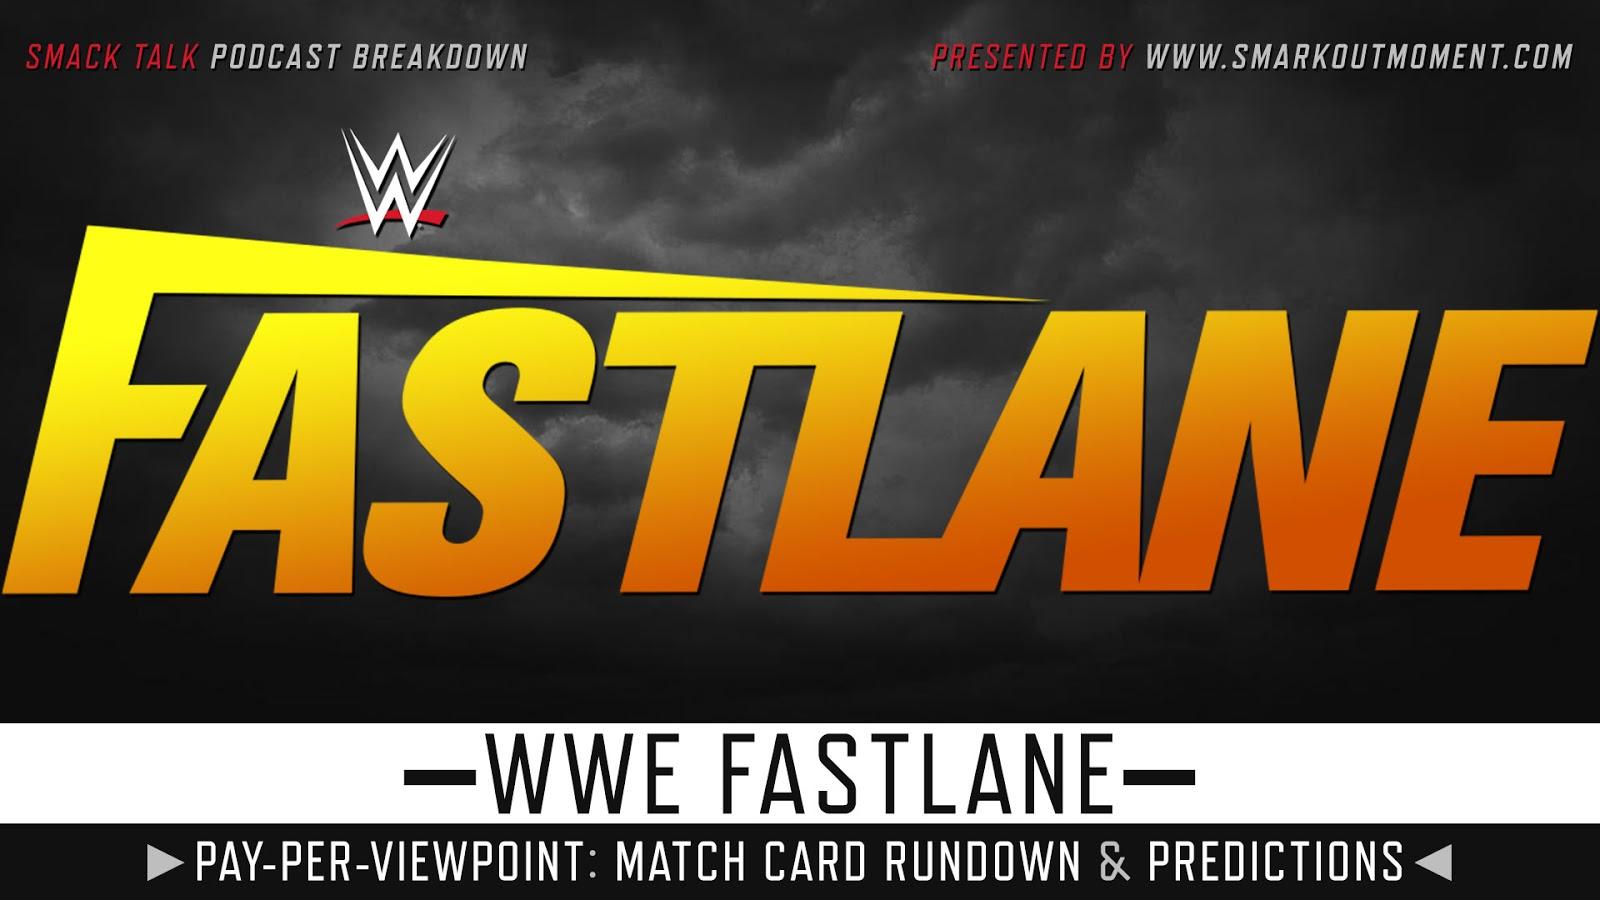 WWE Fastlane 2021 spoilers podcast